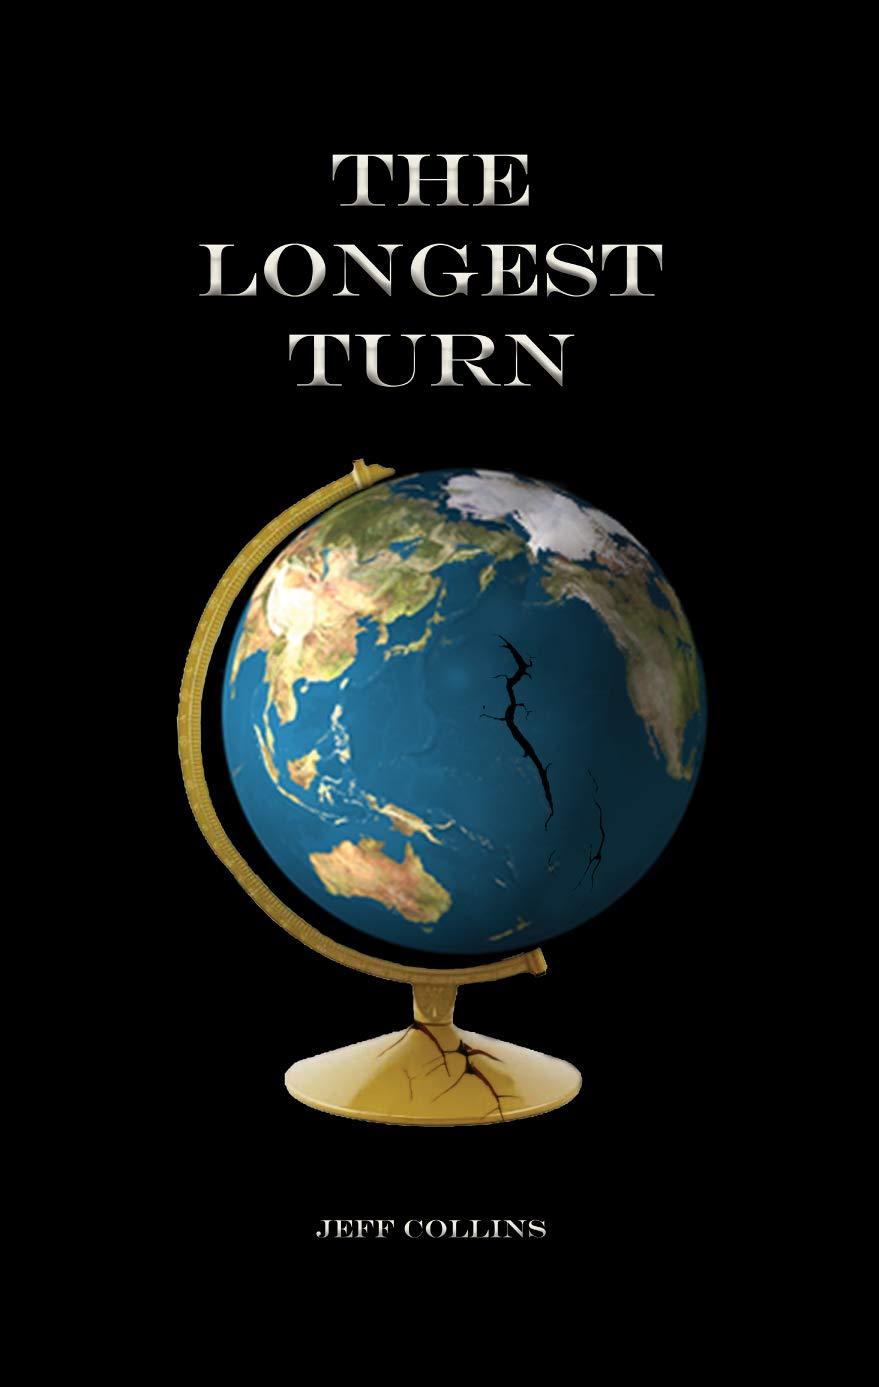 The Longest Turn